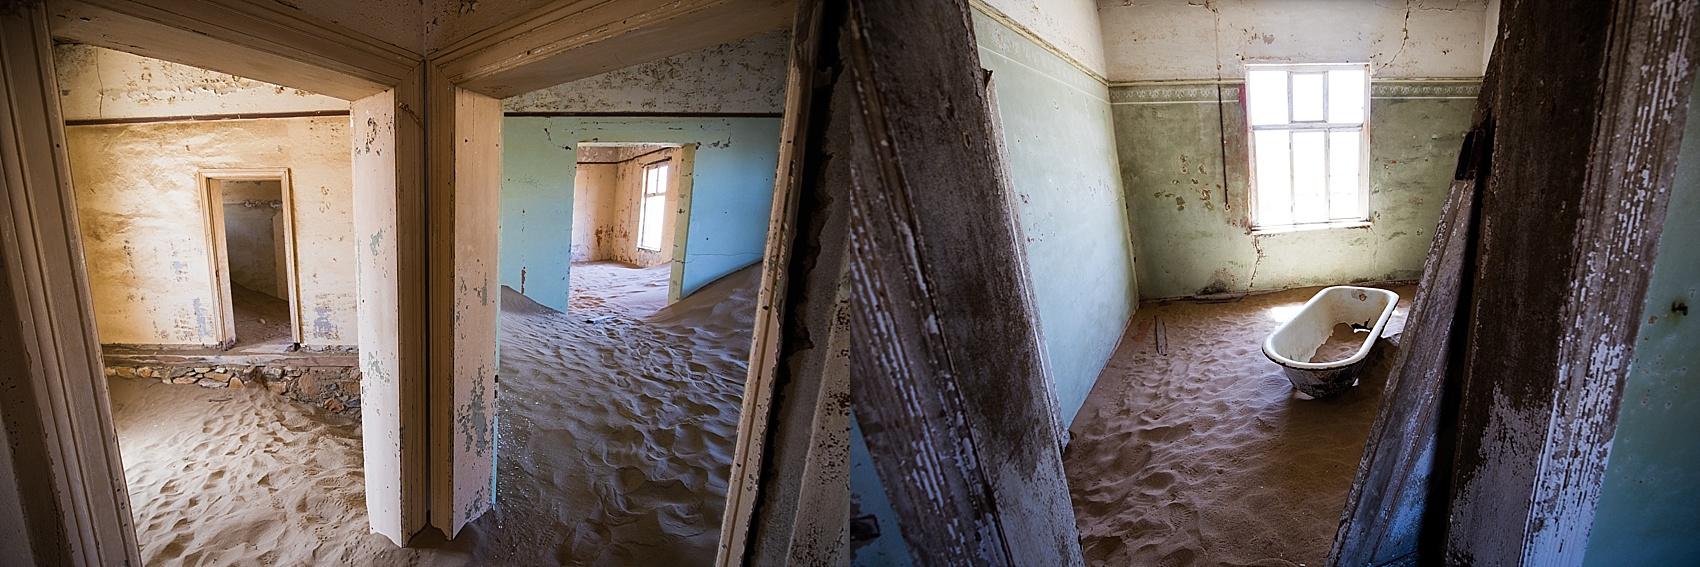 56_SABlog_Kolmanskopp.jpg